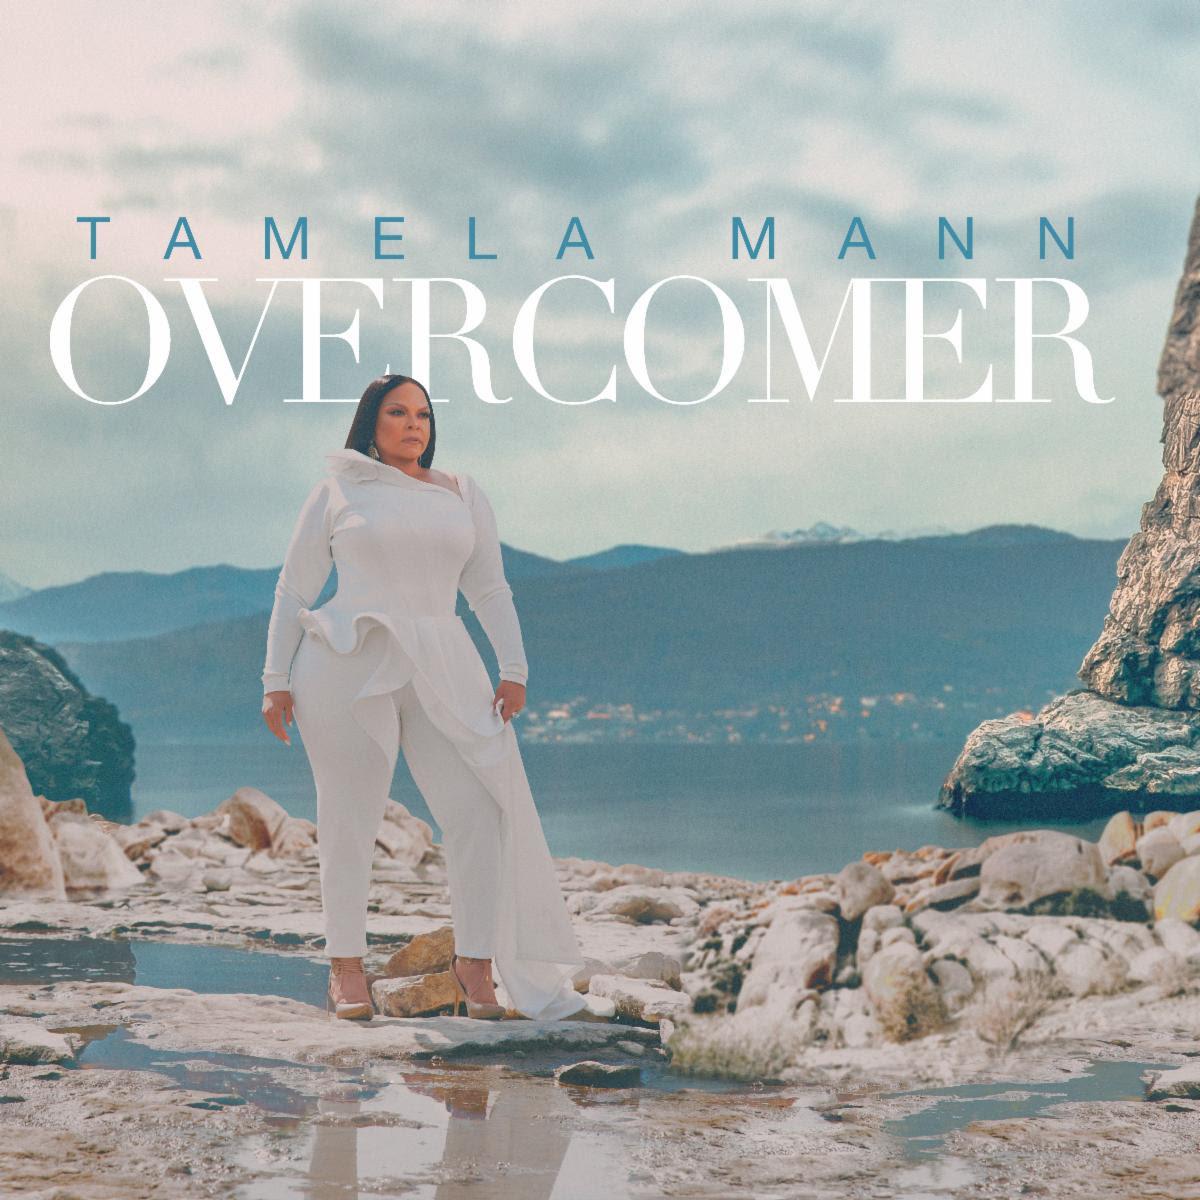 Tamella Mann Overcormer album